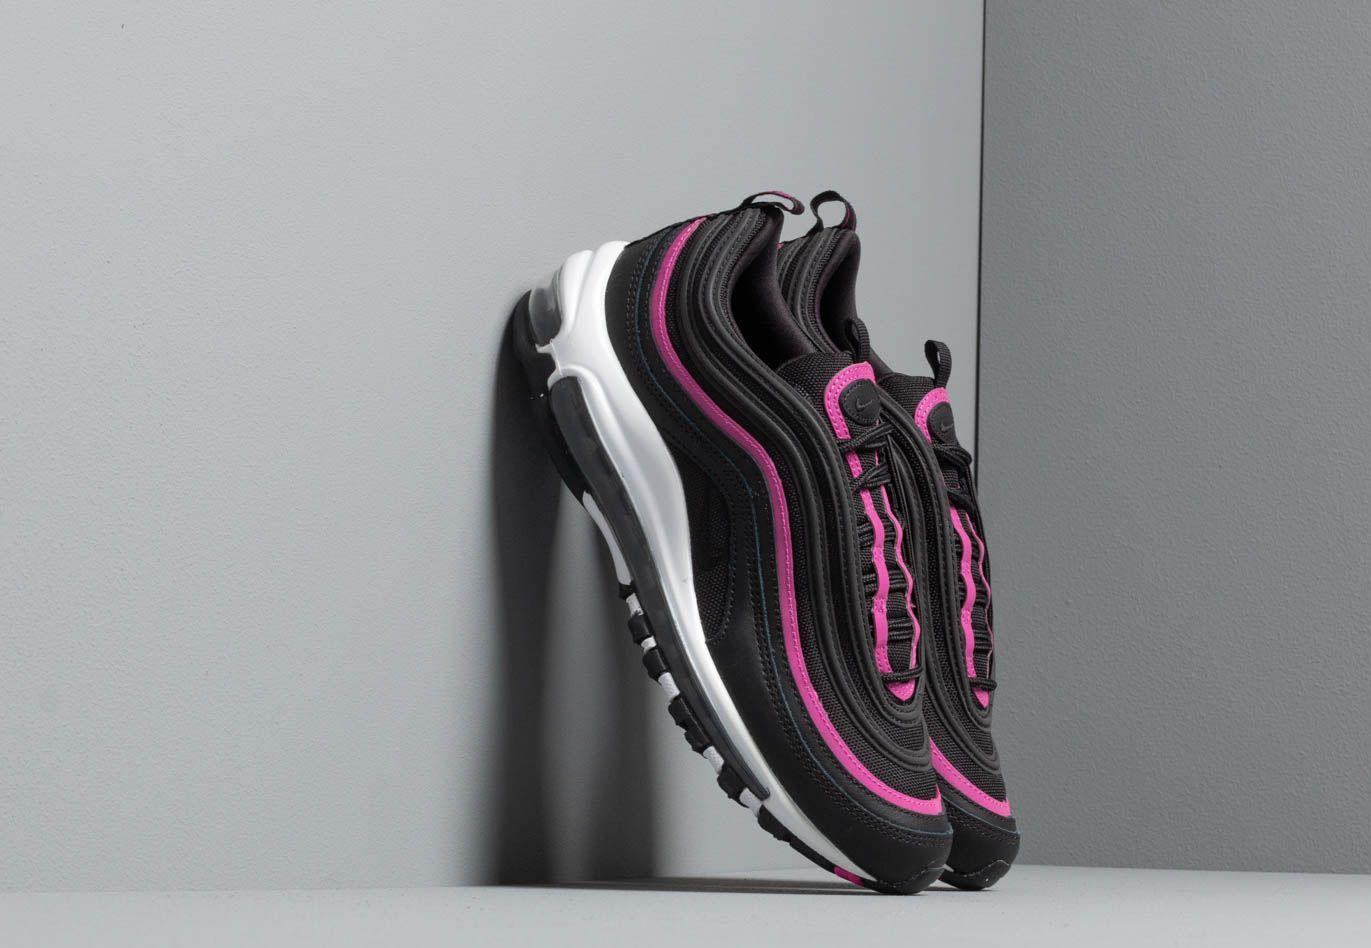 e9944dbc101b Lyst - Nike W Air Max 97 Lx Black  Black-active Fuchsia in Black